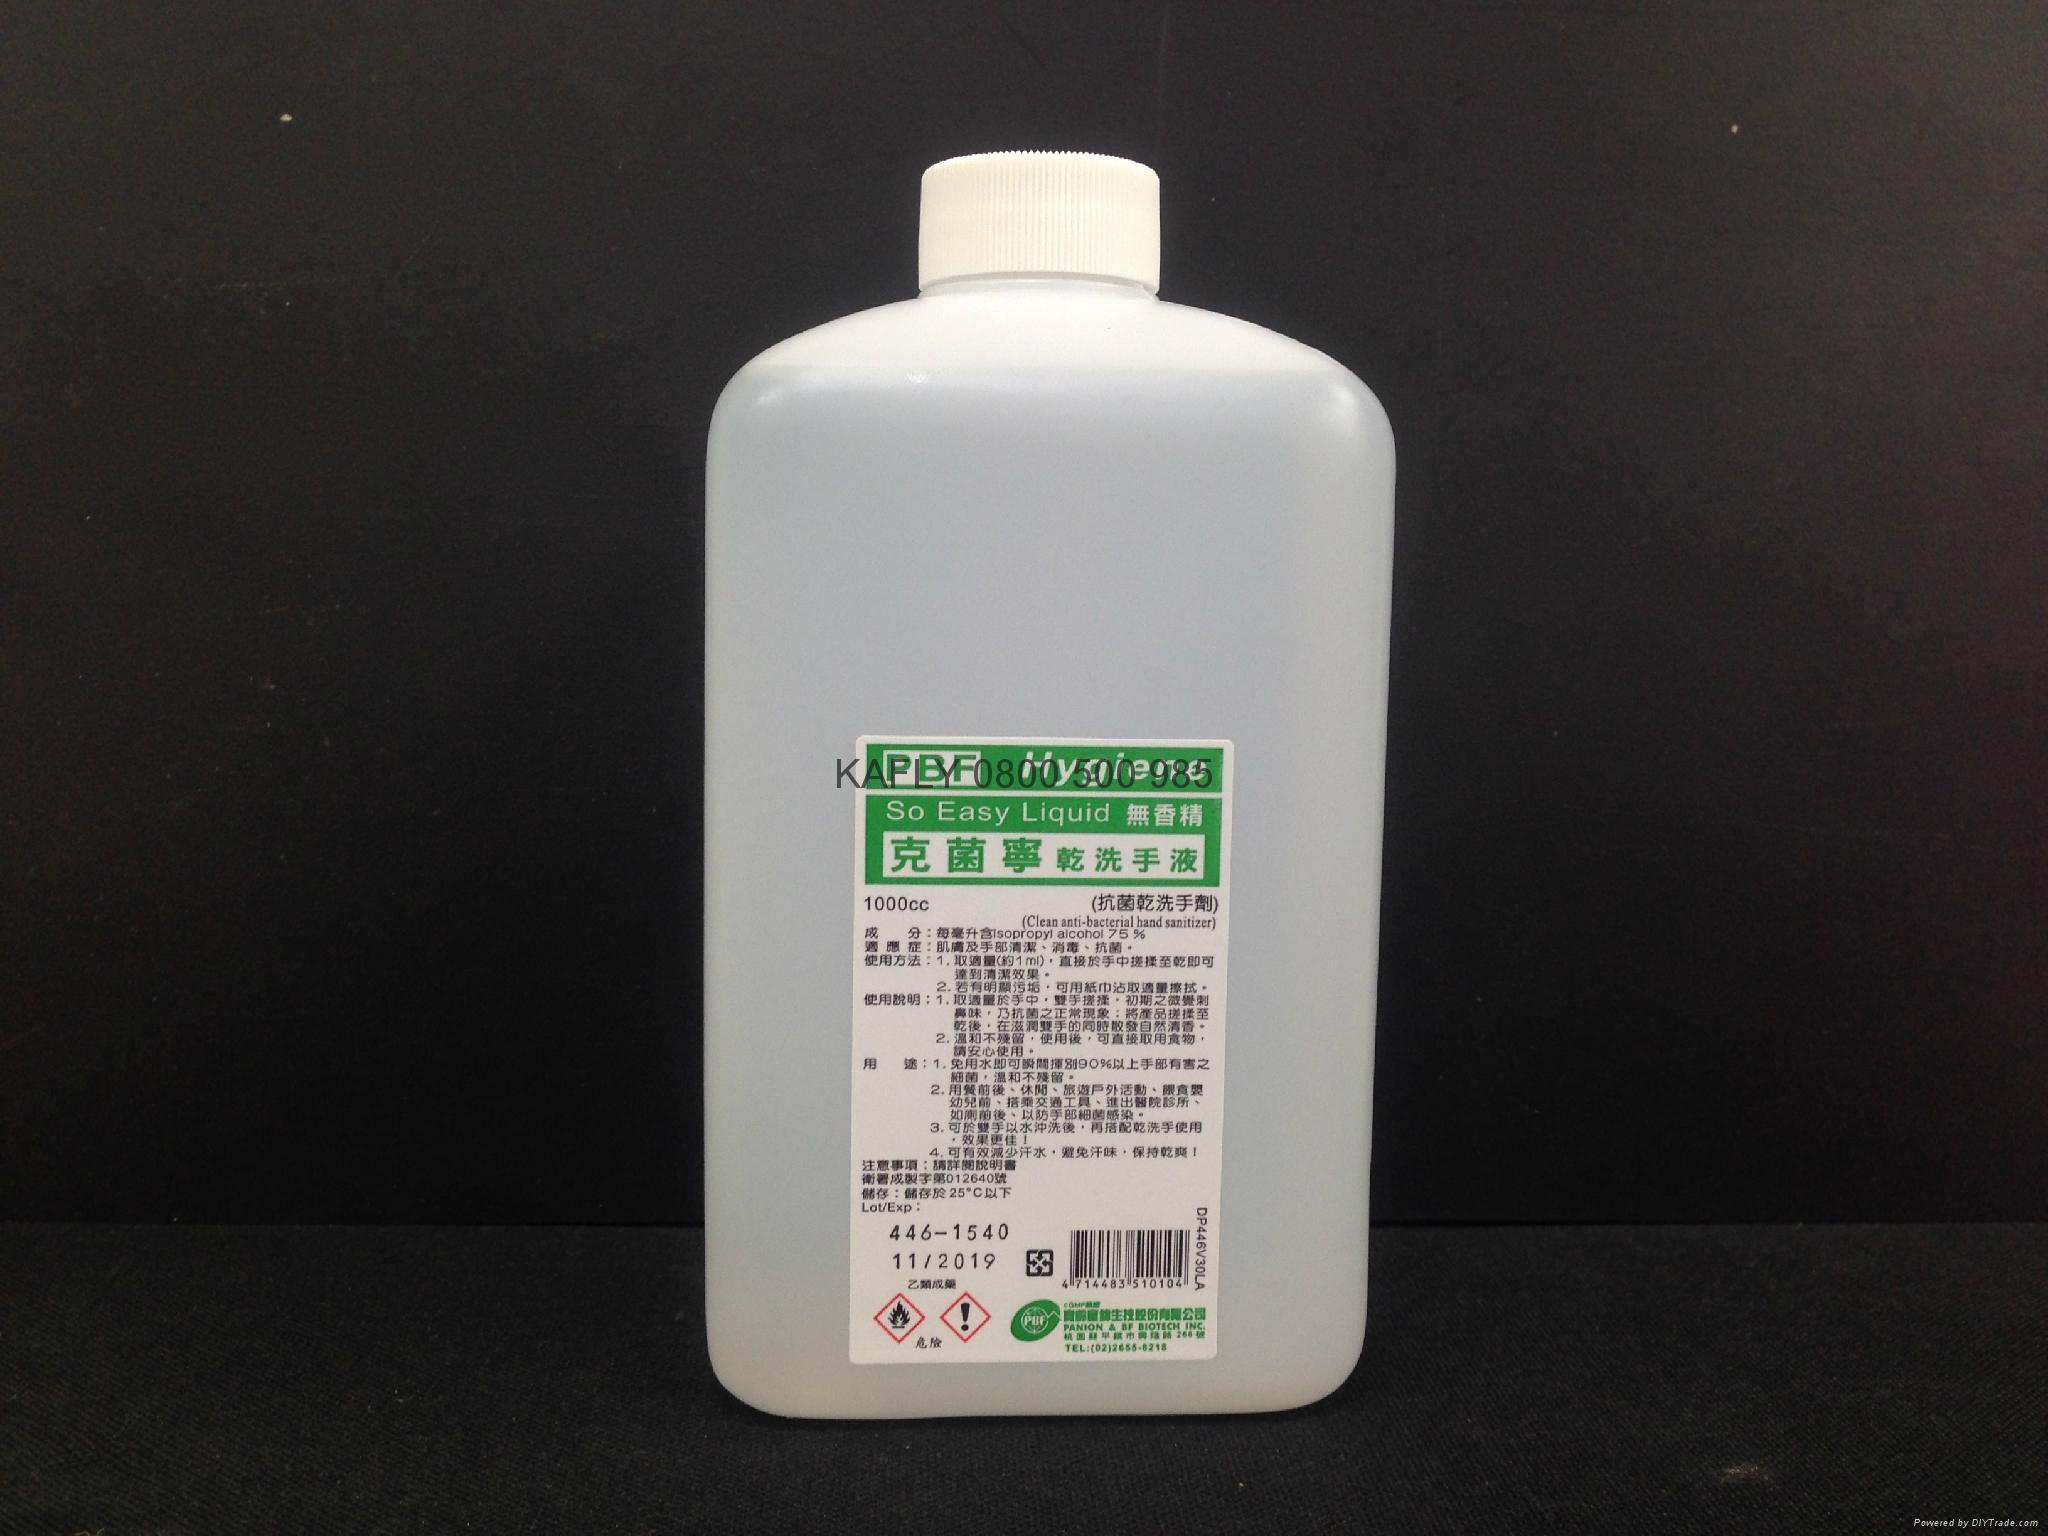 So-Easy Liquid 4